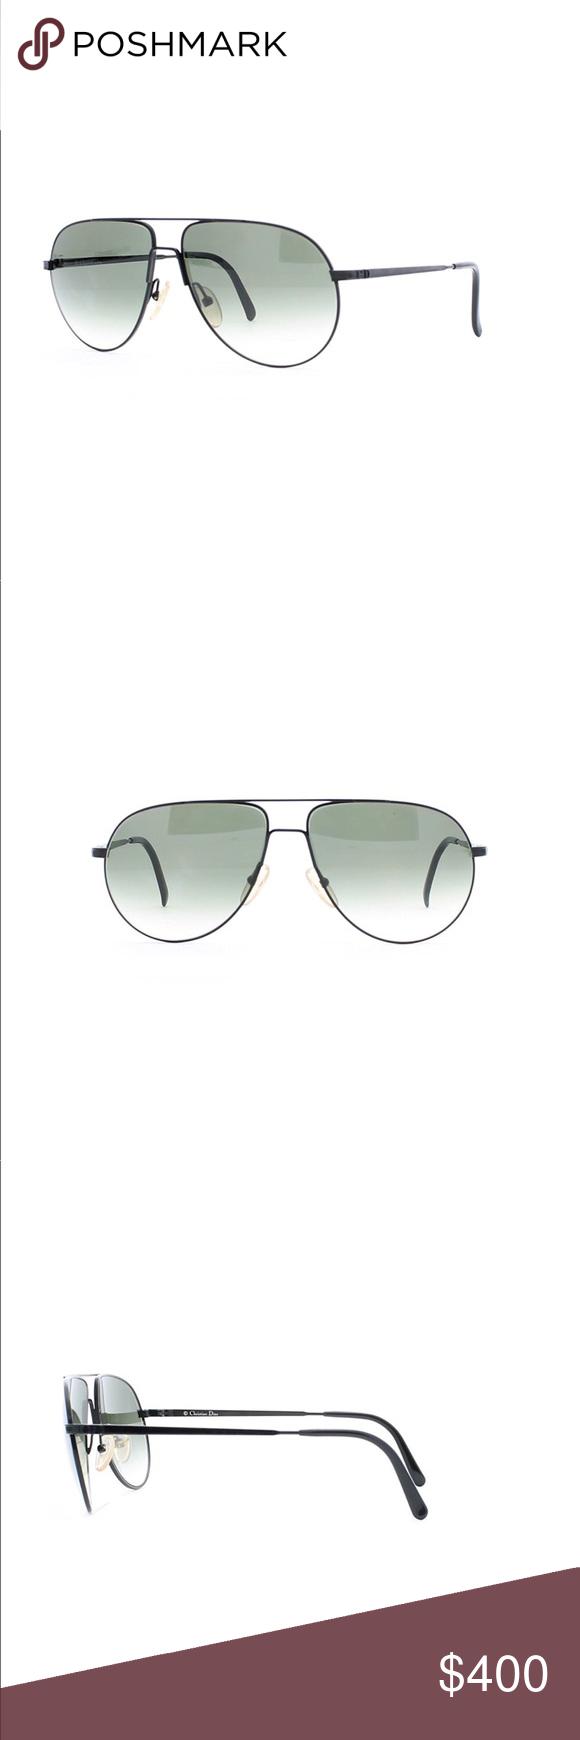 064dce0b37d Vintage Christian Dior Unisex Aviator Sunglasses Vintage Christian Dior  aviator sunglasses in unisex. Both men